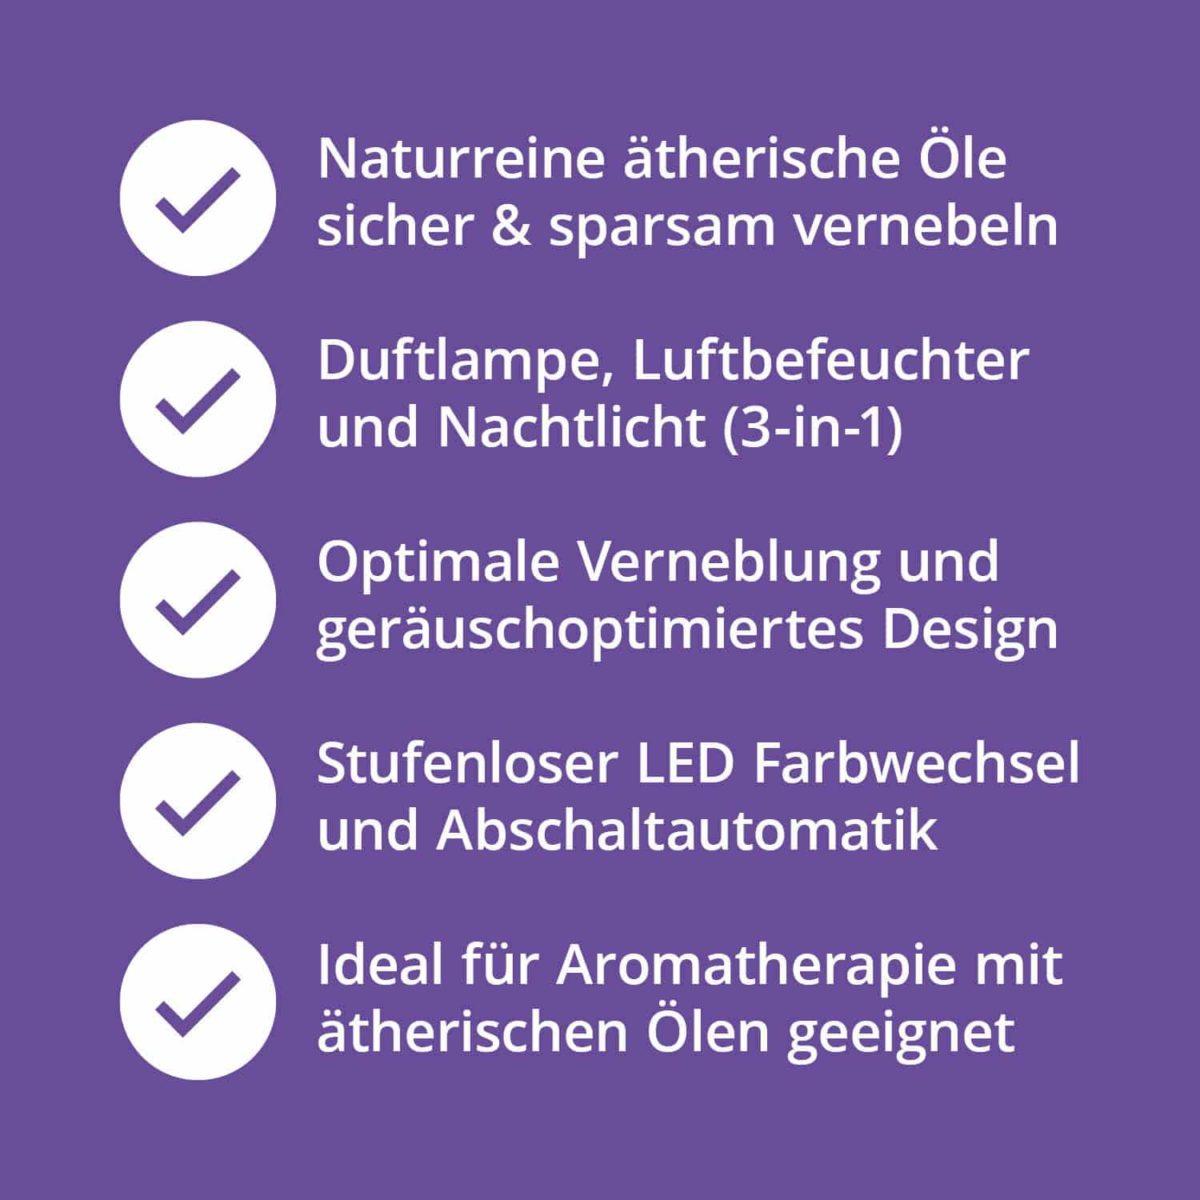 Casida Aroma Diffuser Ceramic Black with LED-lights ätherische Öle Vernebler Aromatherapie leise 20 db Schlafzimmer7